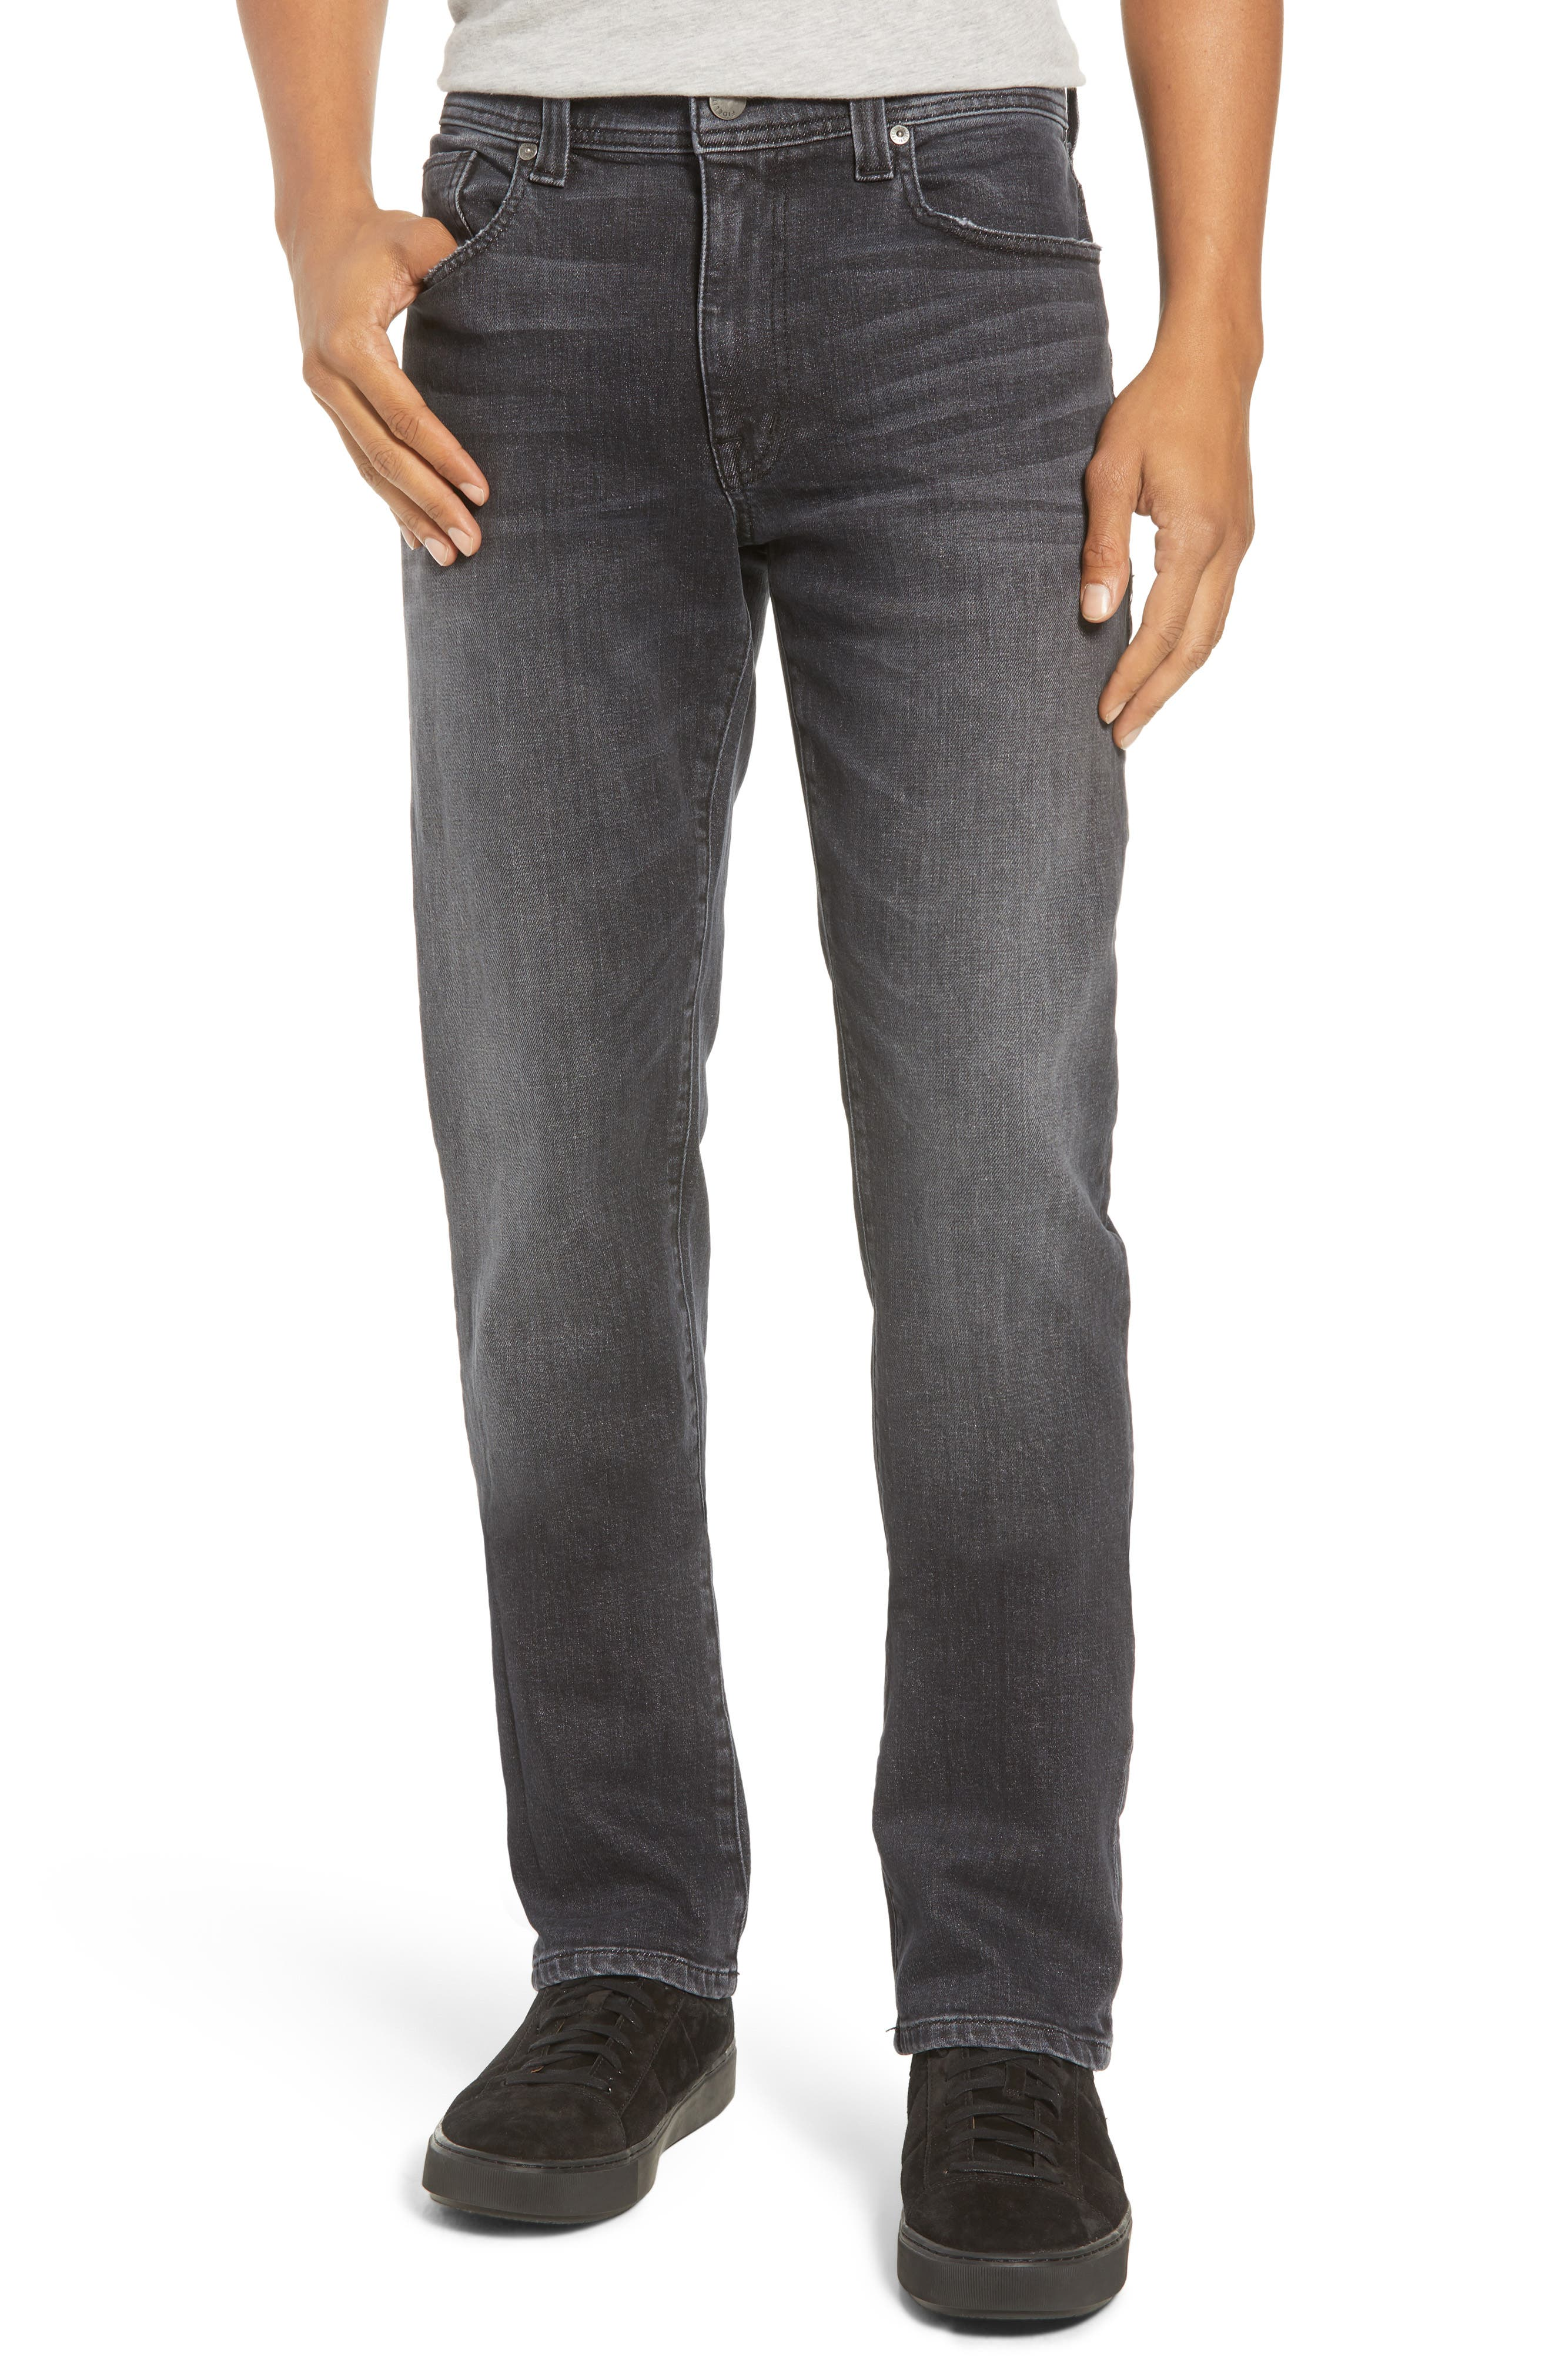 Jimmy Slim Straight Leg Jeans,                             Main thumbnail 1, color,                             RAVEN VINTAGE